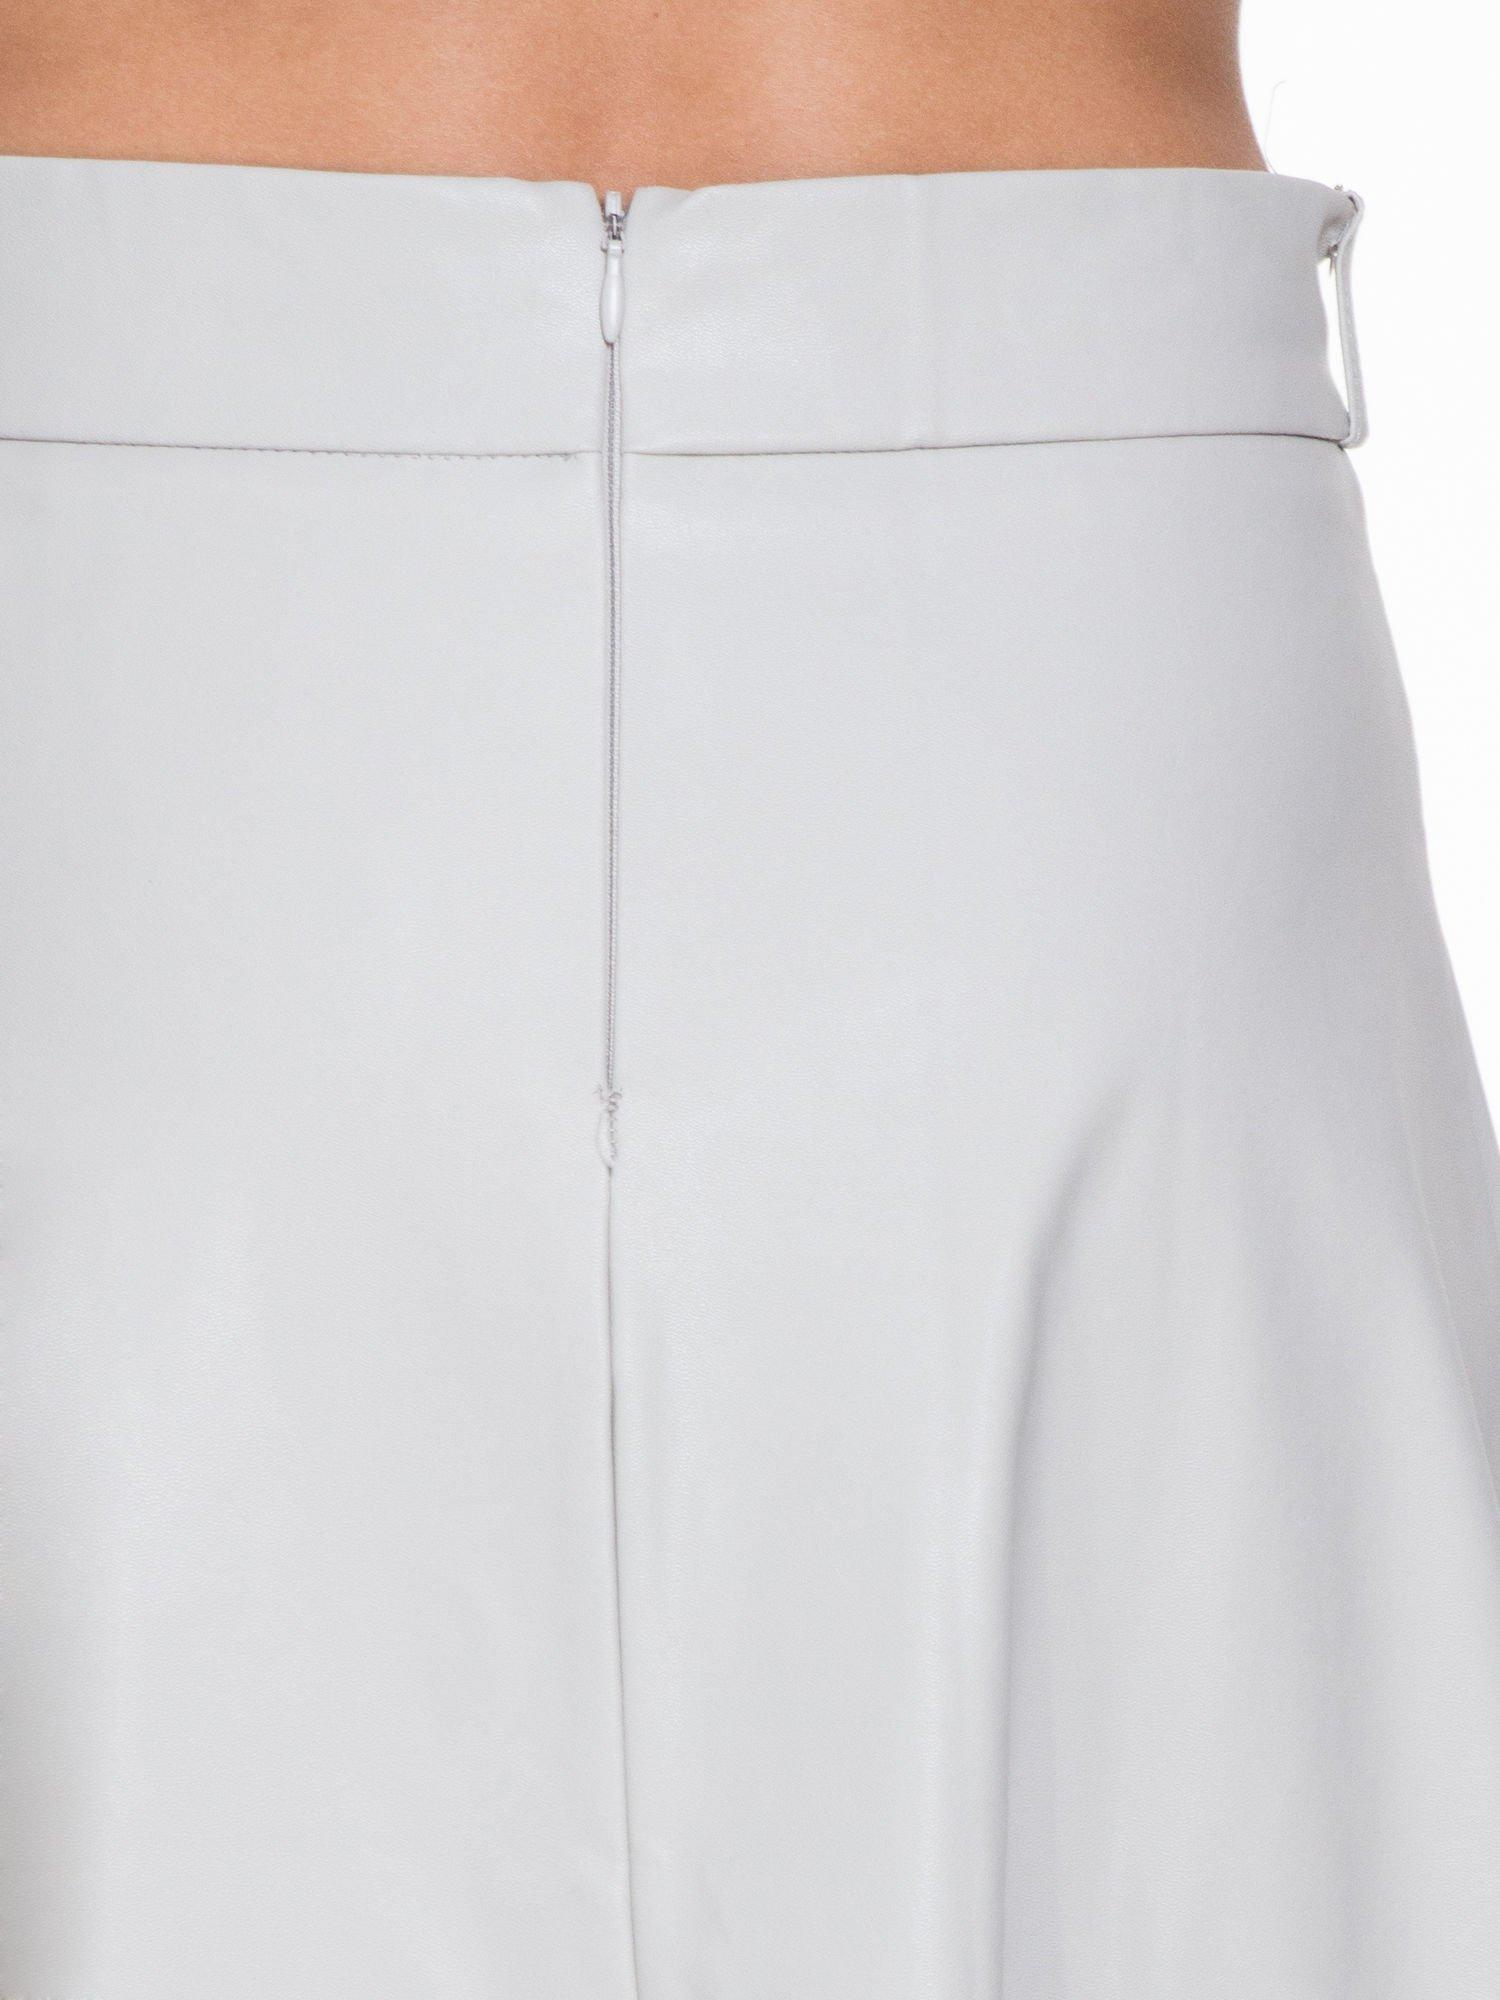 Szara skórzana spódnica midi szyta z półkola                                  zdj.                                  6